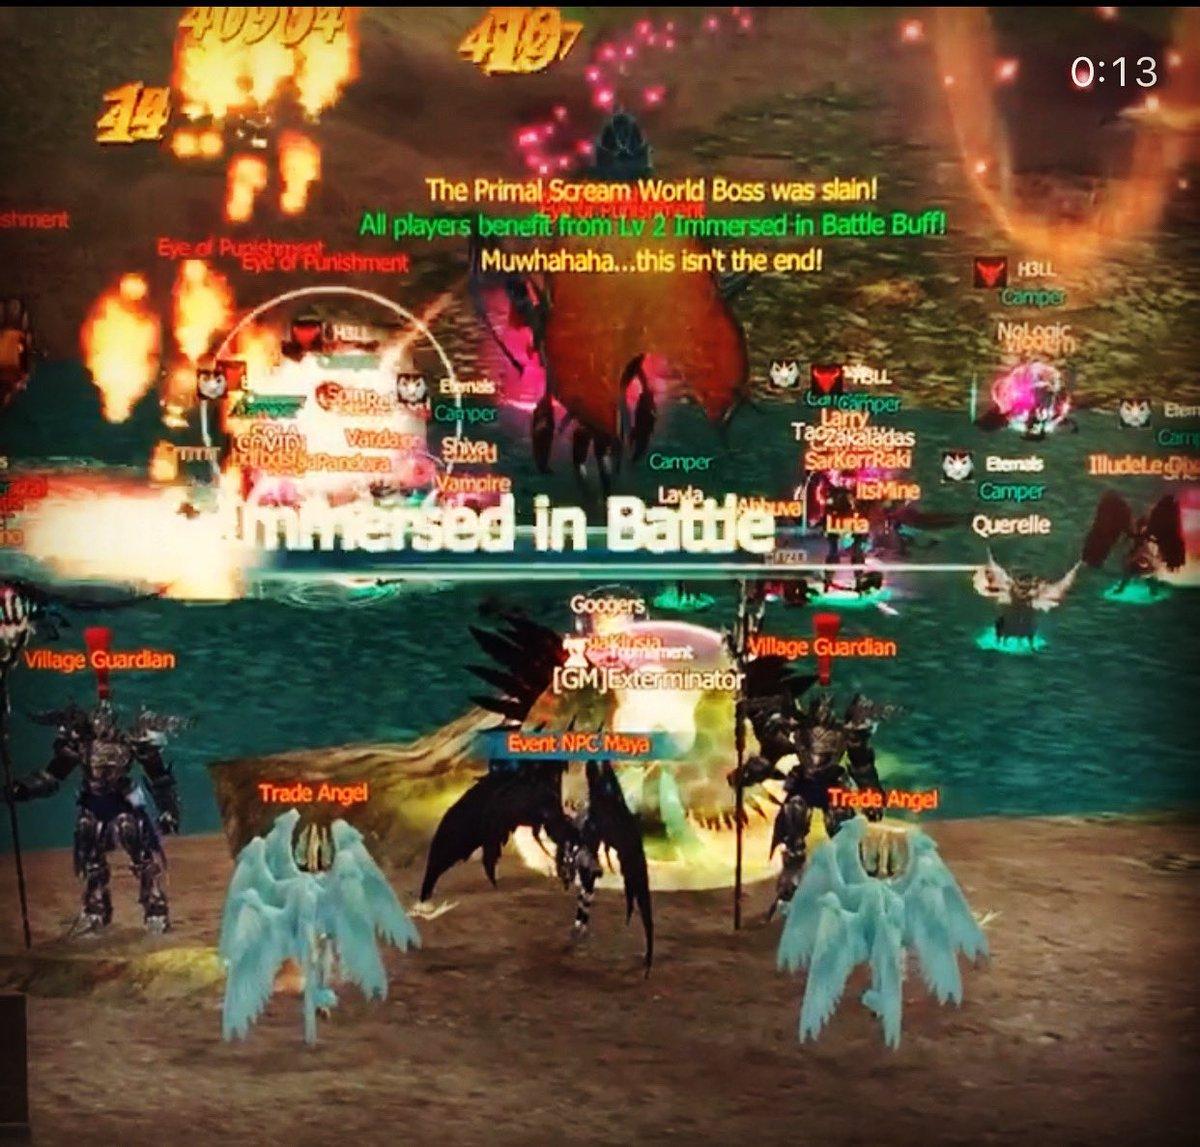 Boss Spawn Event in 15 min! Location: horizon lake near pvp field   8k+ 𝚁𝚎𝚐𝚒𝚜𝚝𝚛𝚊𝚝𝚒𝚘𝚗𝚜↴ http://www.RappelzTournament.com   #videogames #game #gamergirl #gamerguy #onlinegaming #gamers #online  #mmo #mmorpg #pcgaming #pc #gaming #gamer #rappelz #games #rappelztournamentpic.twitter.com/jm9e2fxHqe